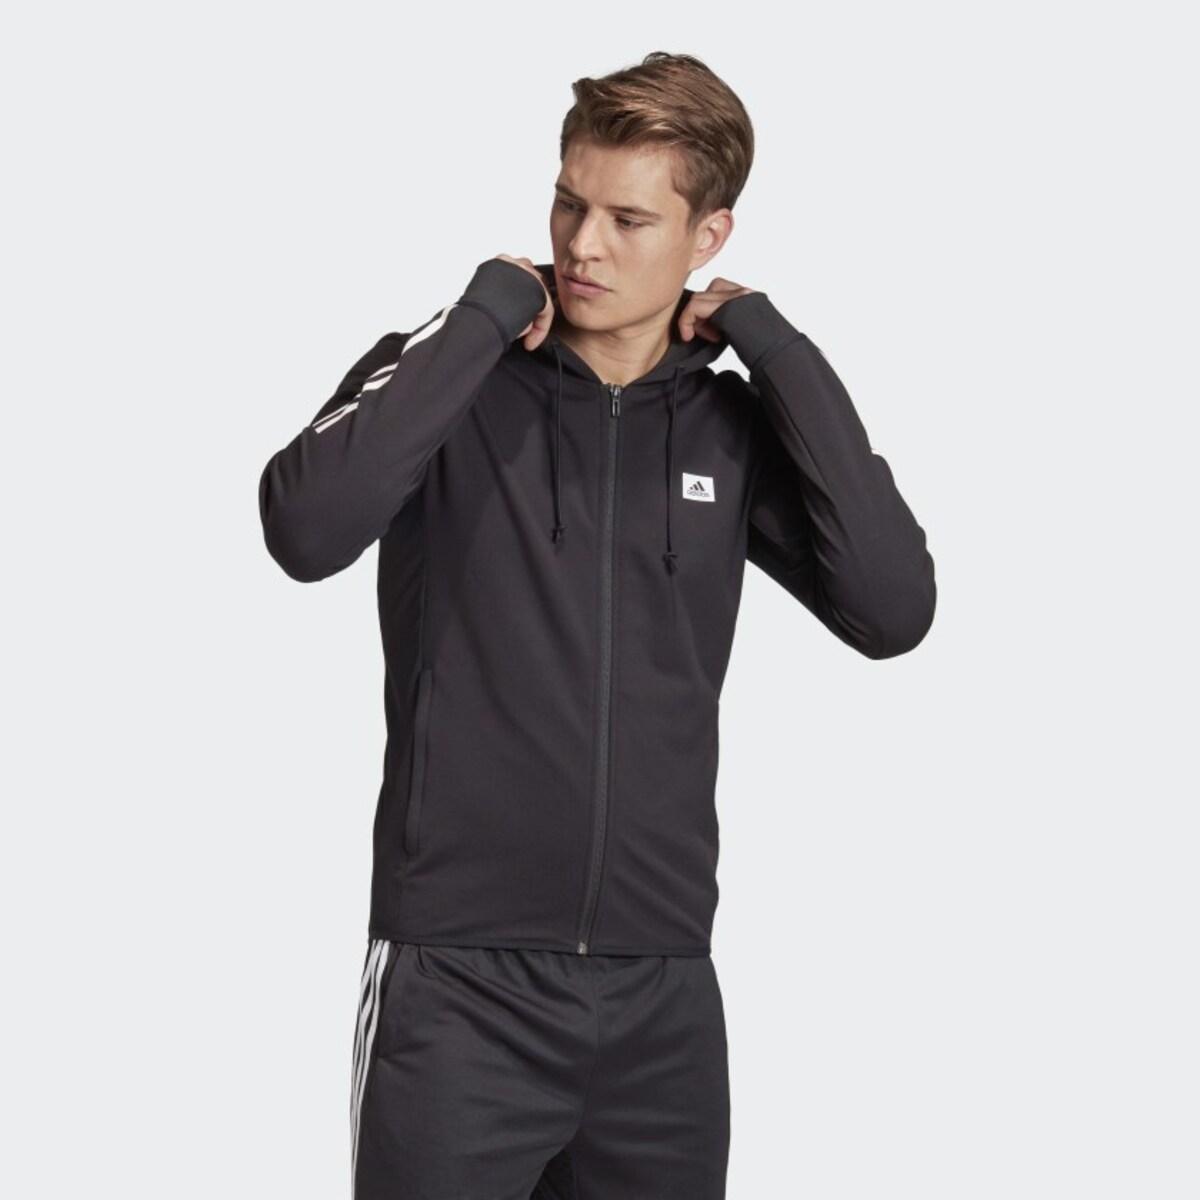 Designed to Move Motion Erkek Kapüşonlu Siyah Spor Üst